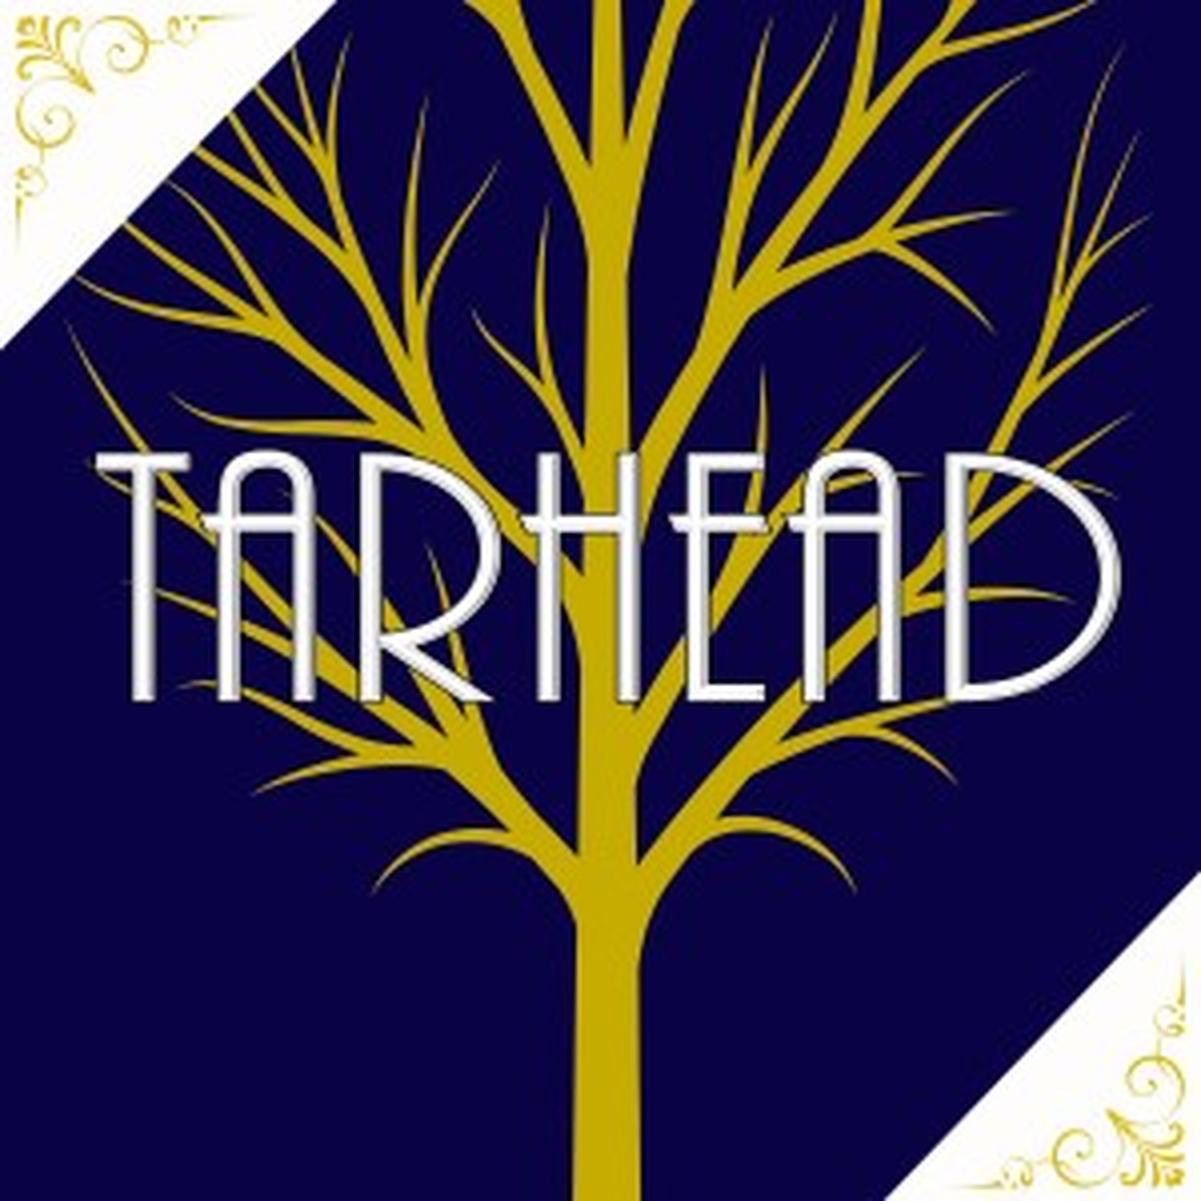 Tarhead